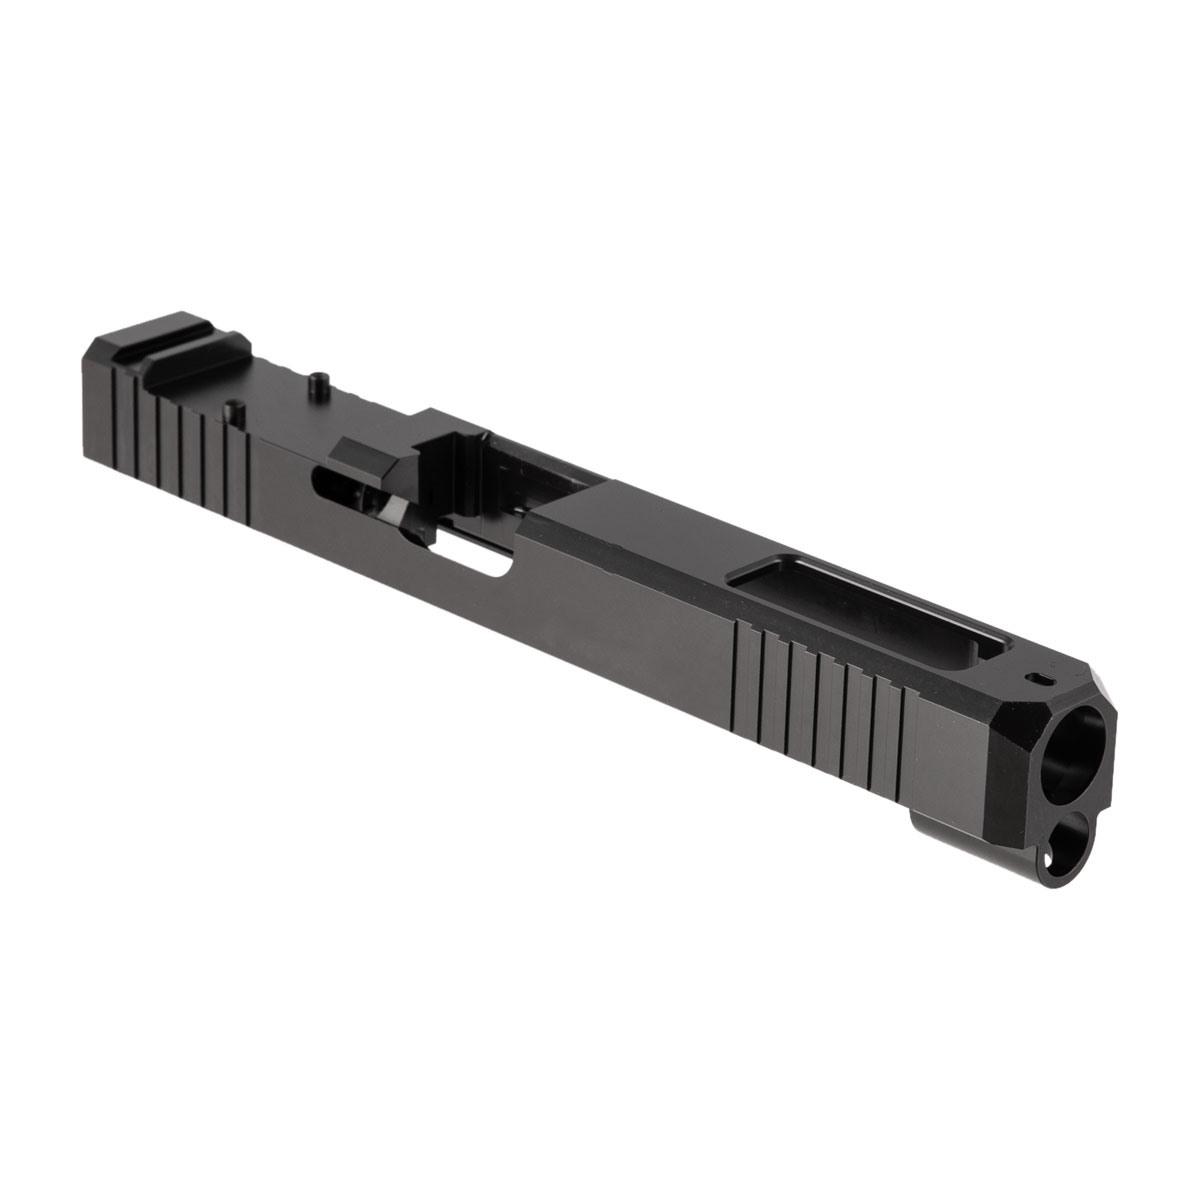 hight resolution of brownells rmr cut slide for glock 34